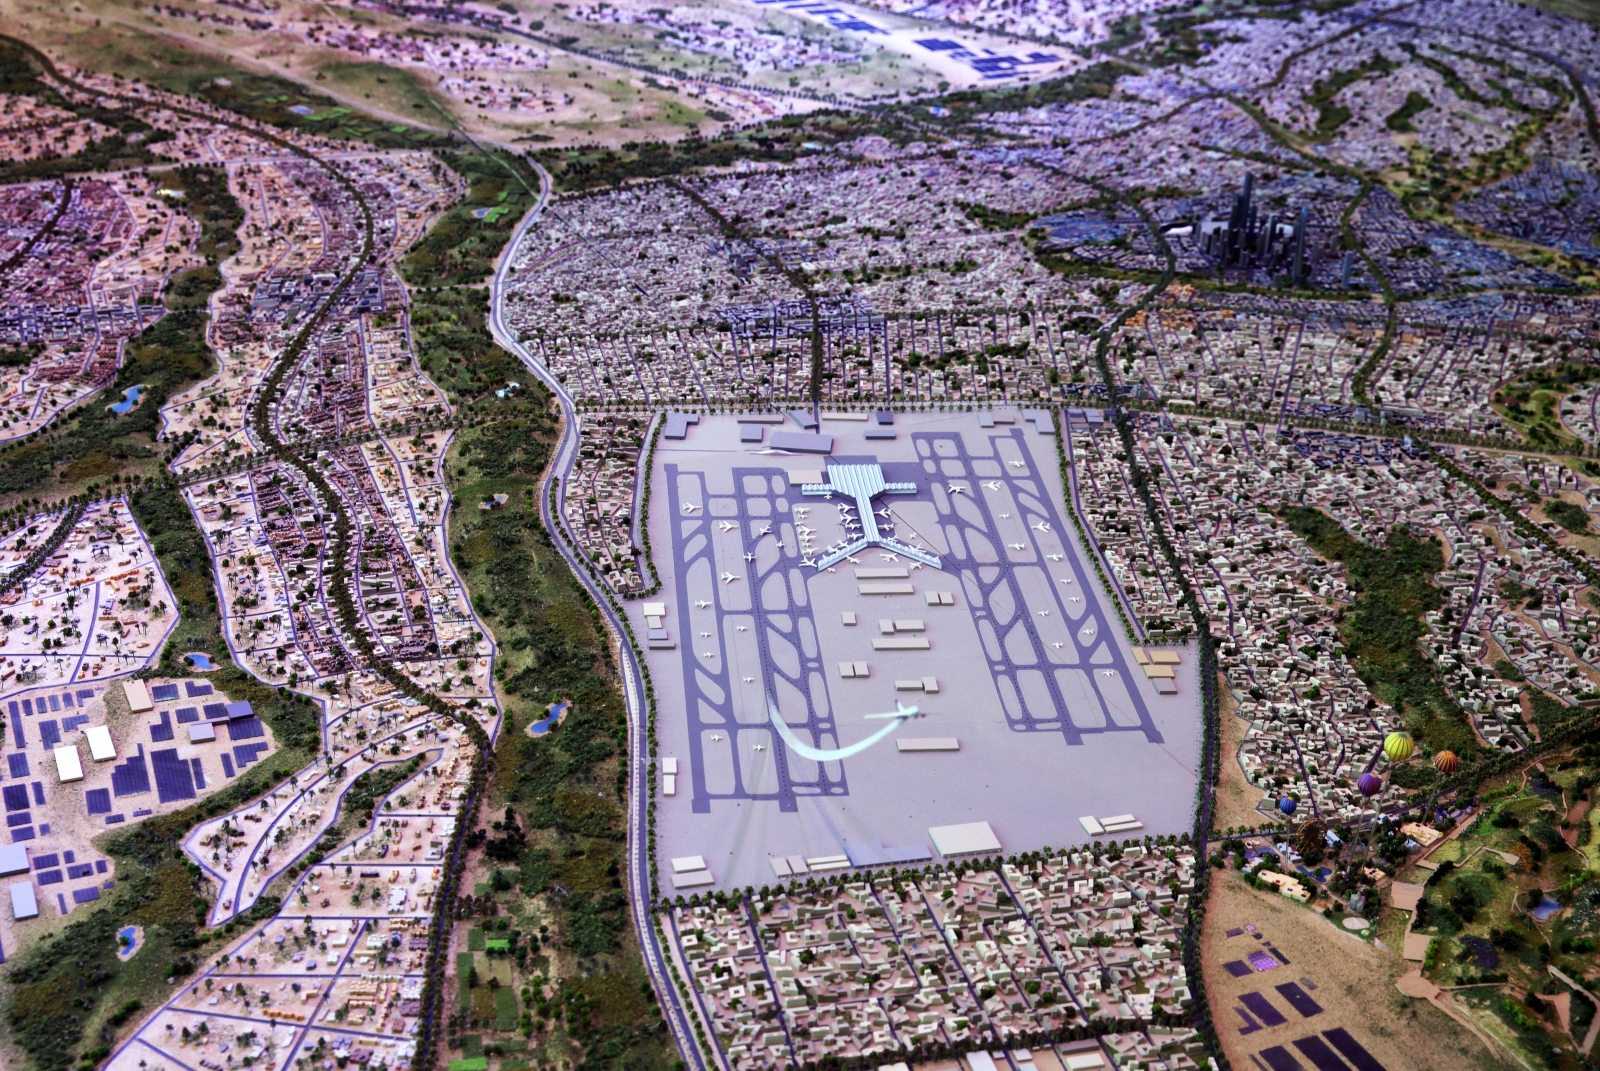 Egypts New Capital plan revealed